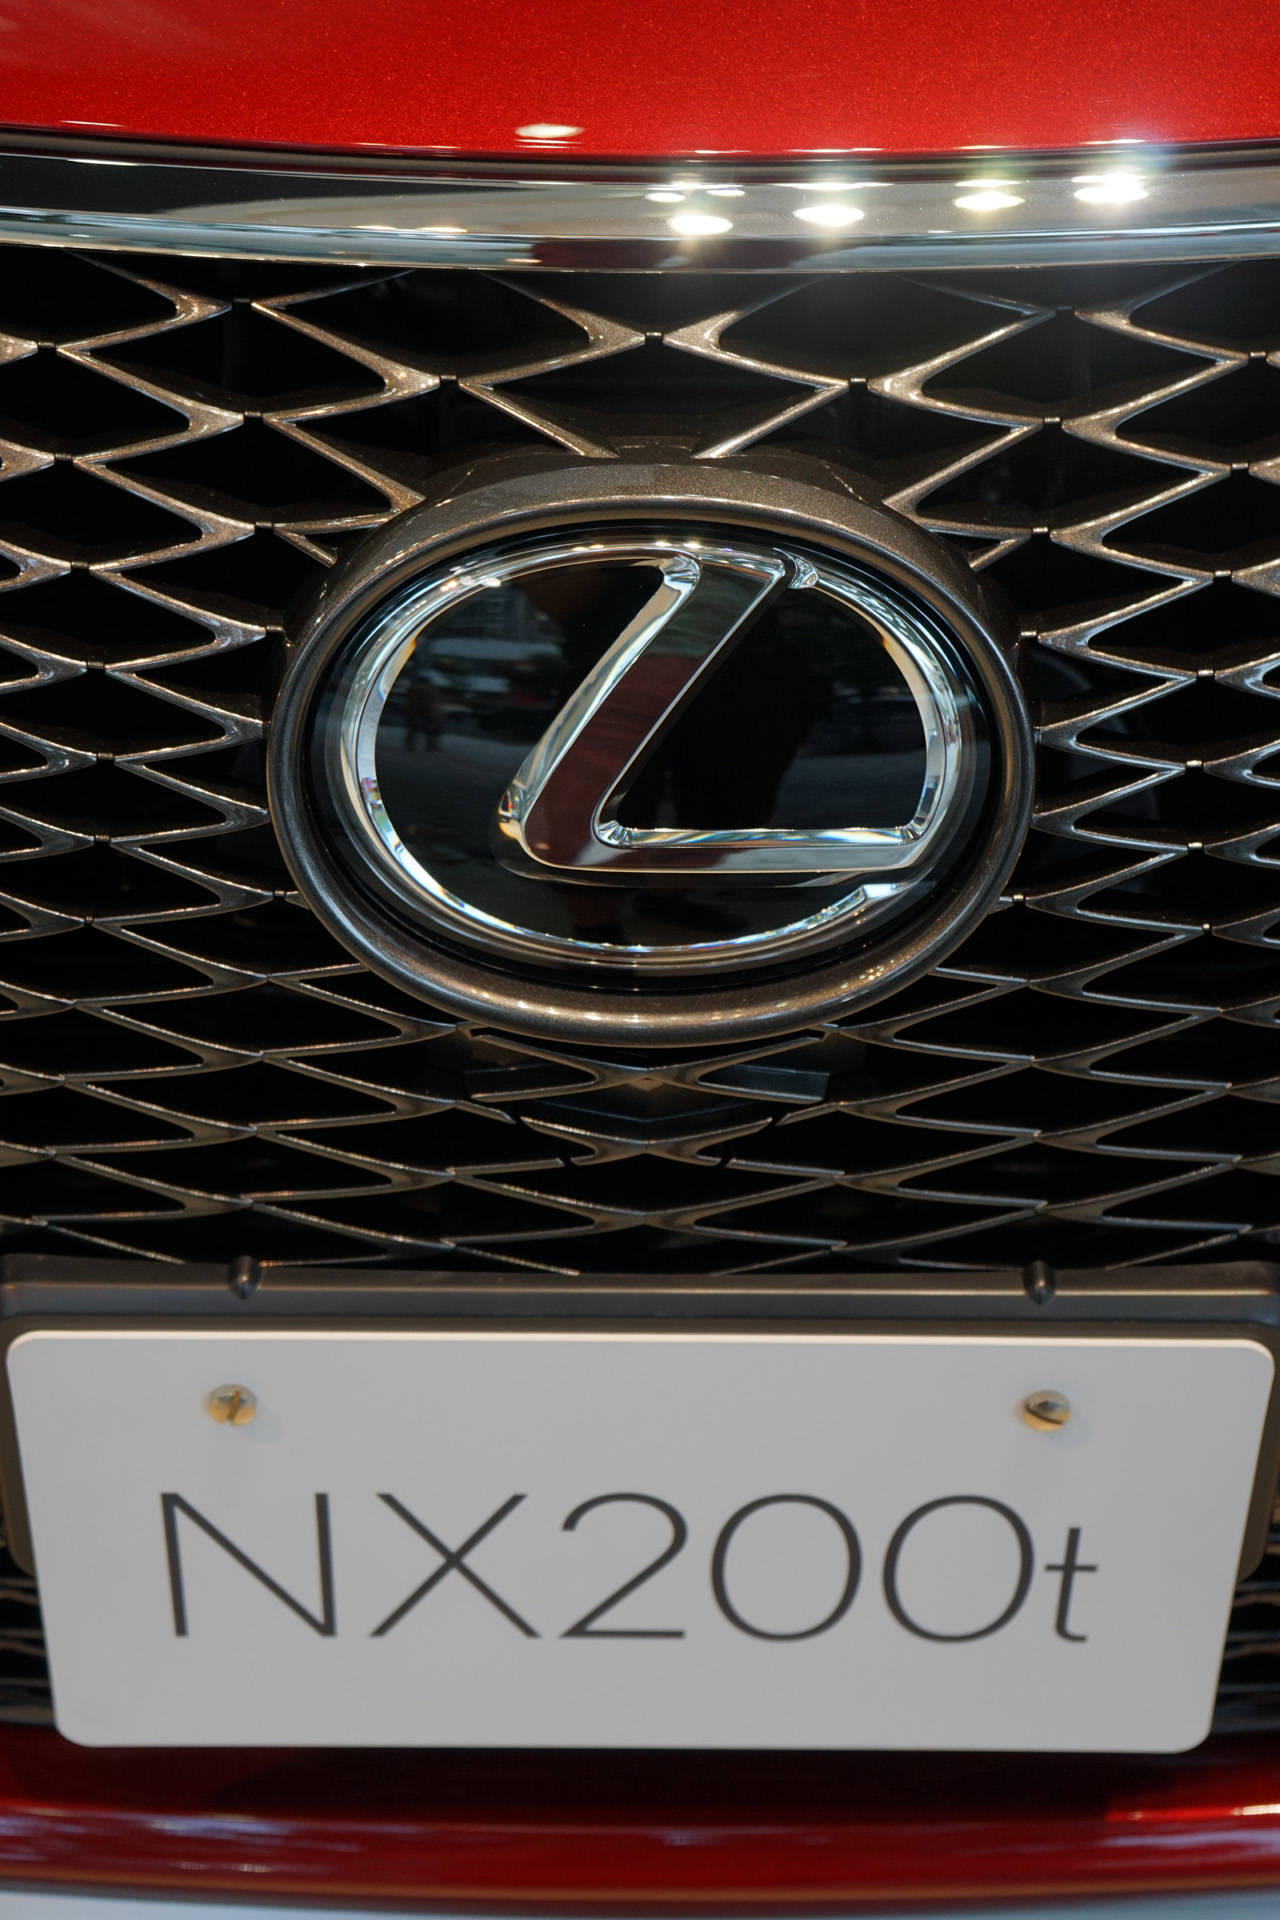 NX200t21_2014070201021017d.jpg